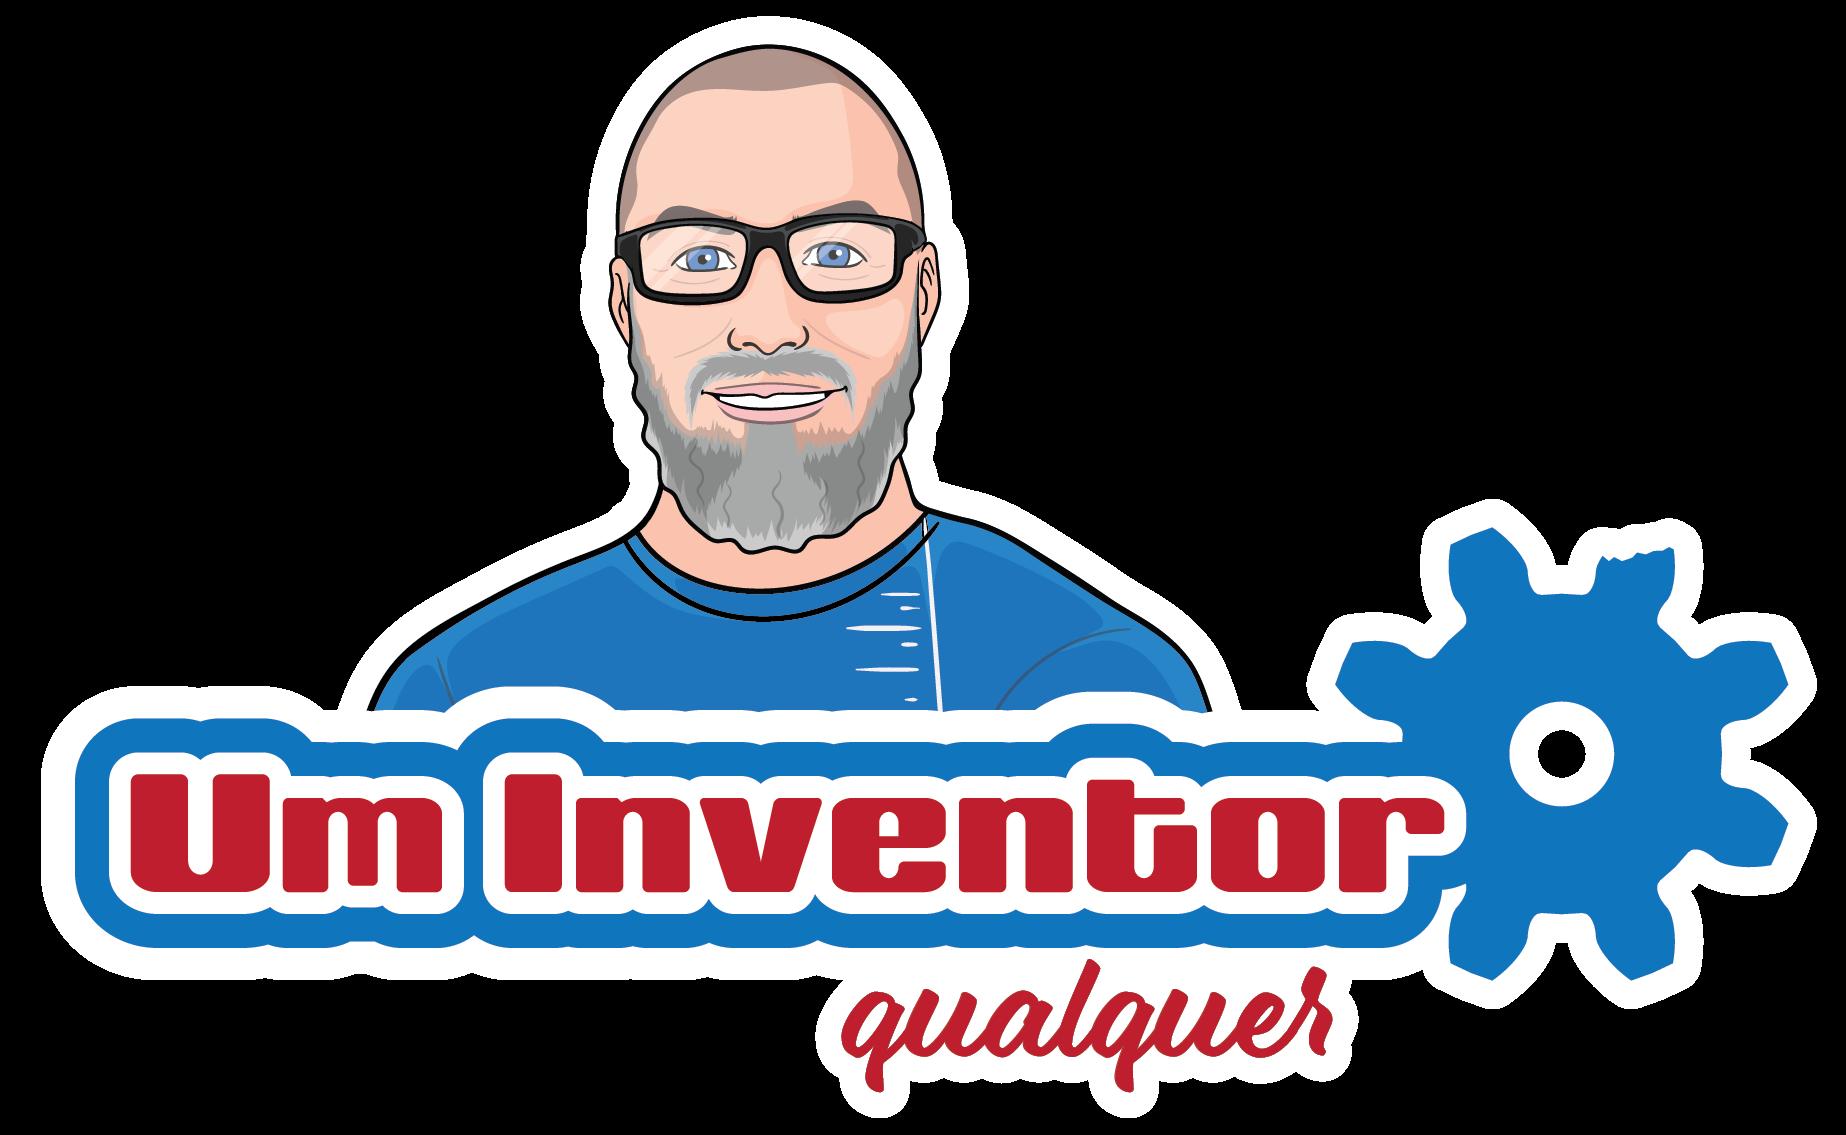 Um Inventor Qualquer